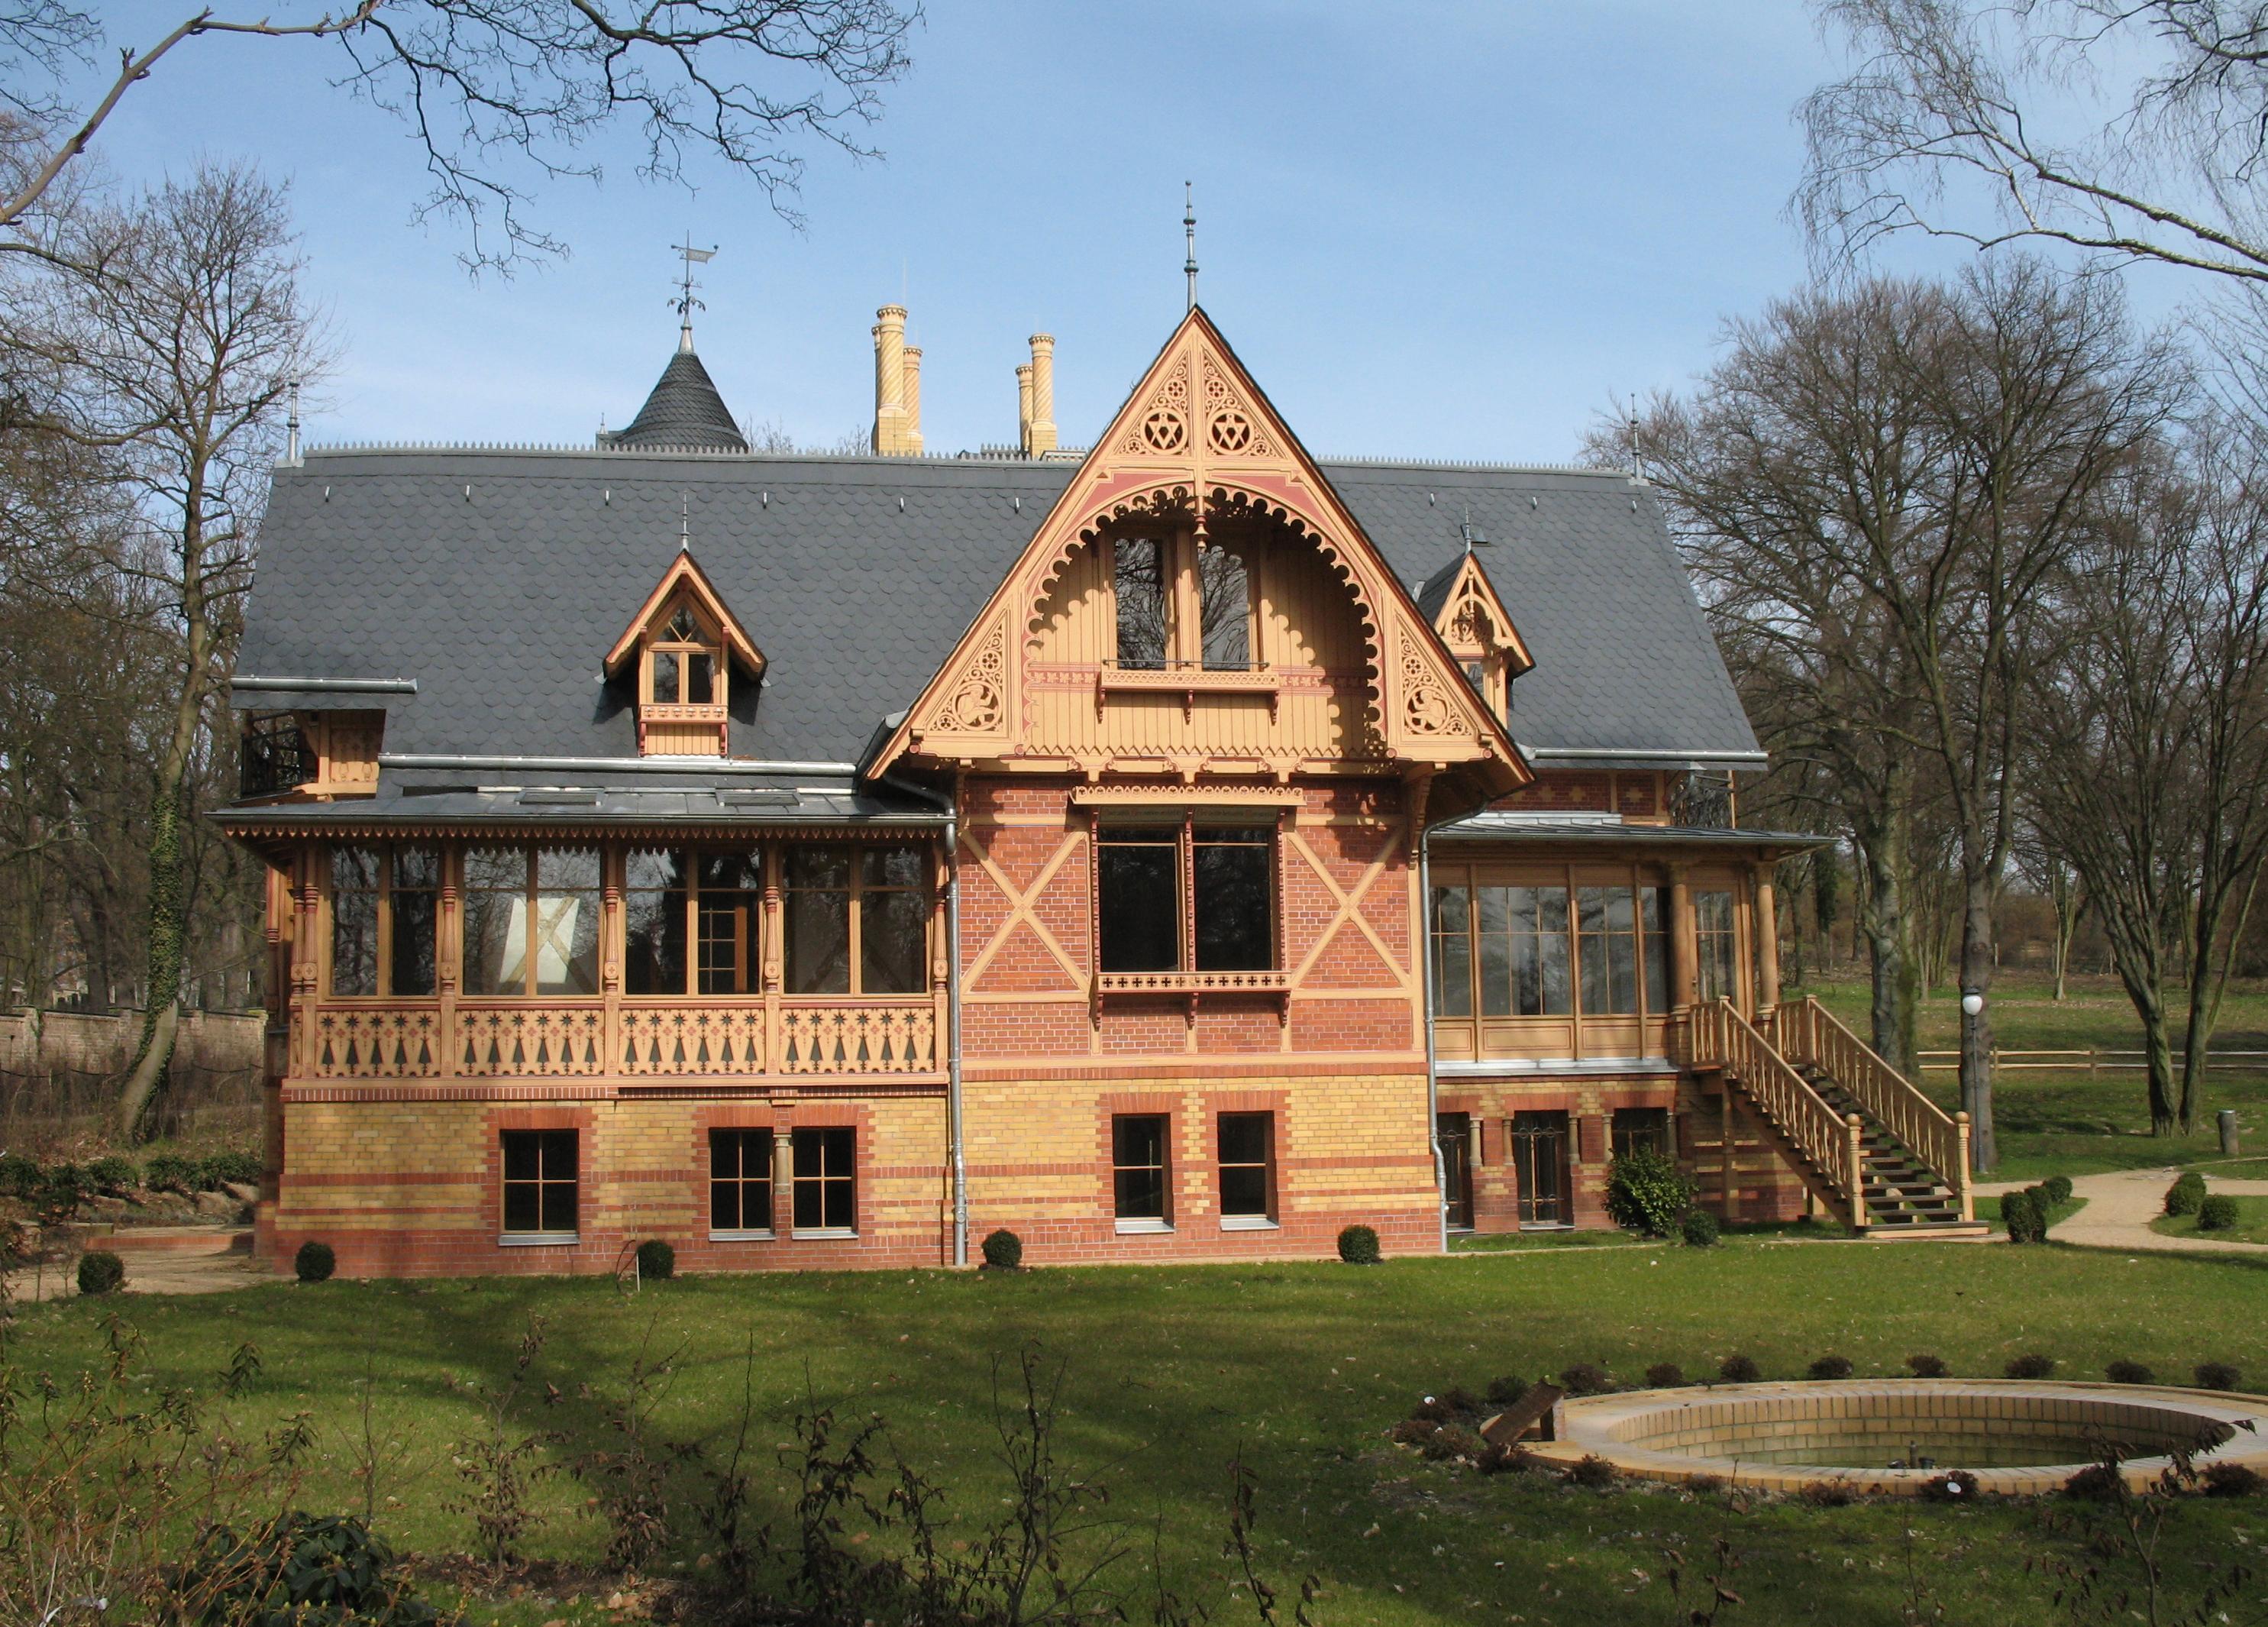 http://upload.wikimedia.org/wikipedia/commons/b/ba/Potsdam_Villa_Gericke.jpg